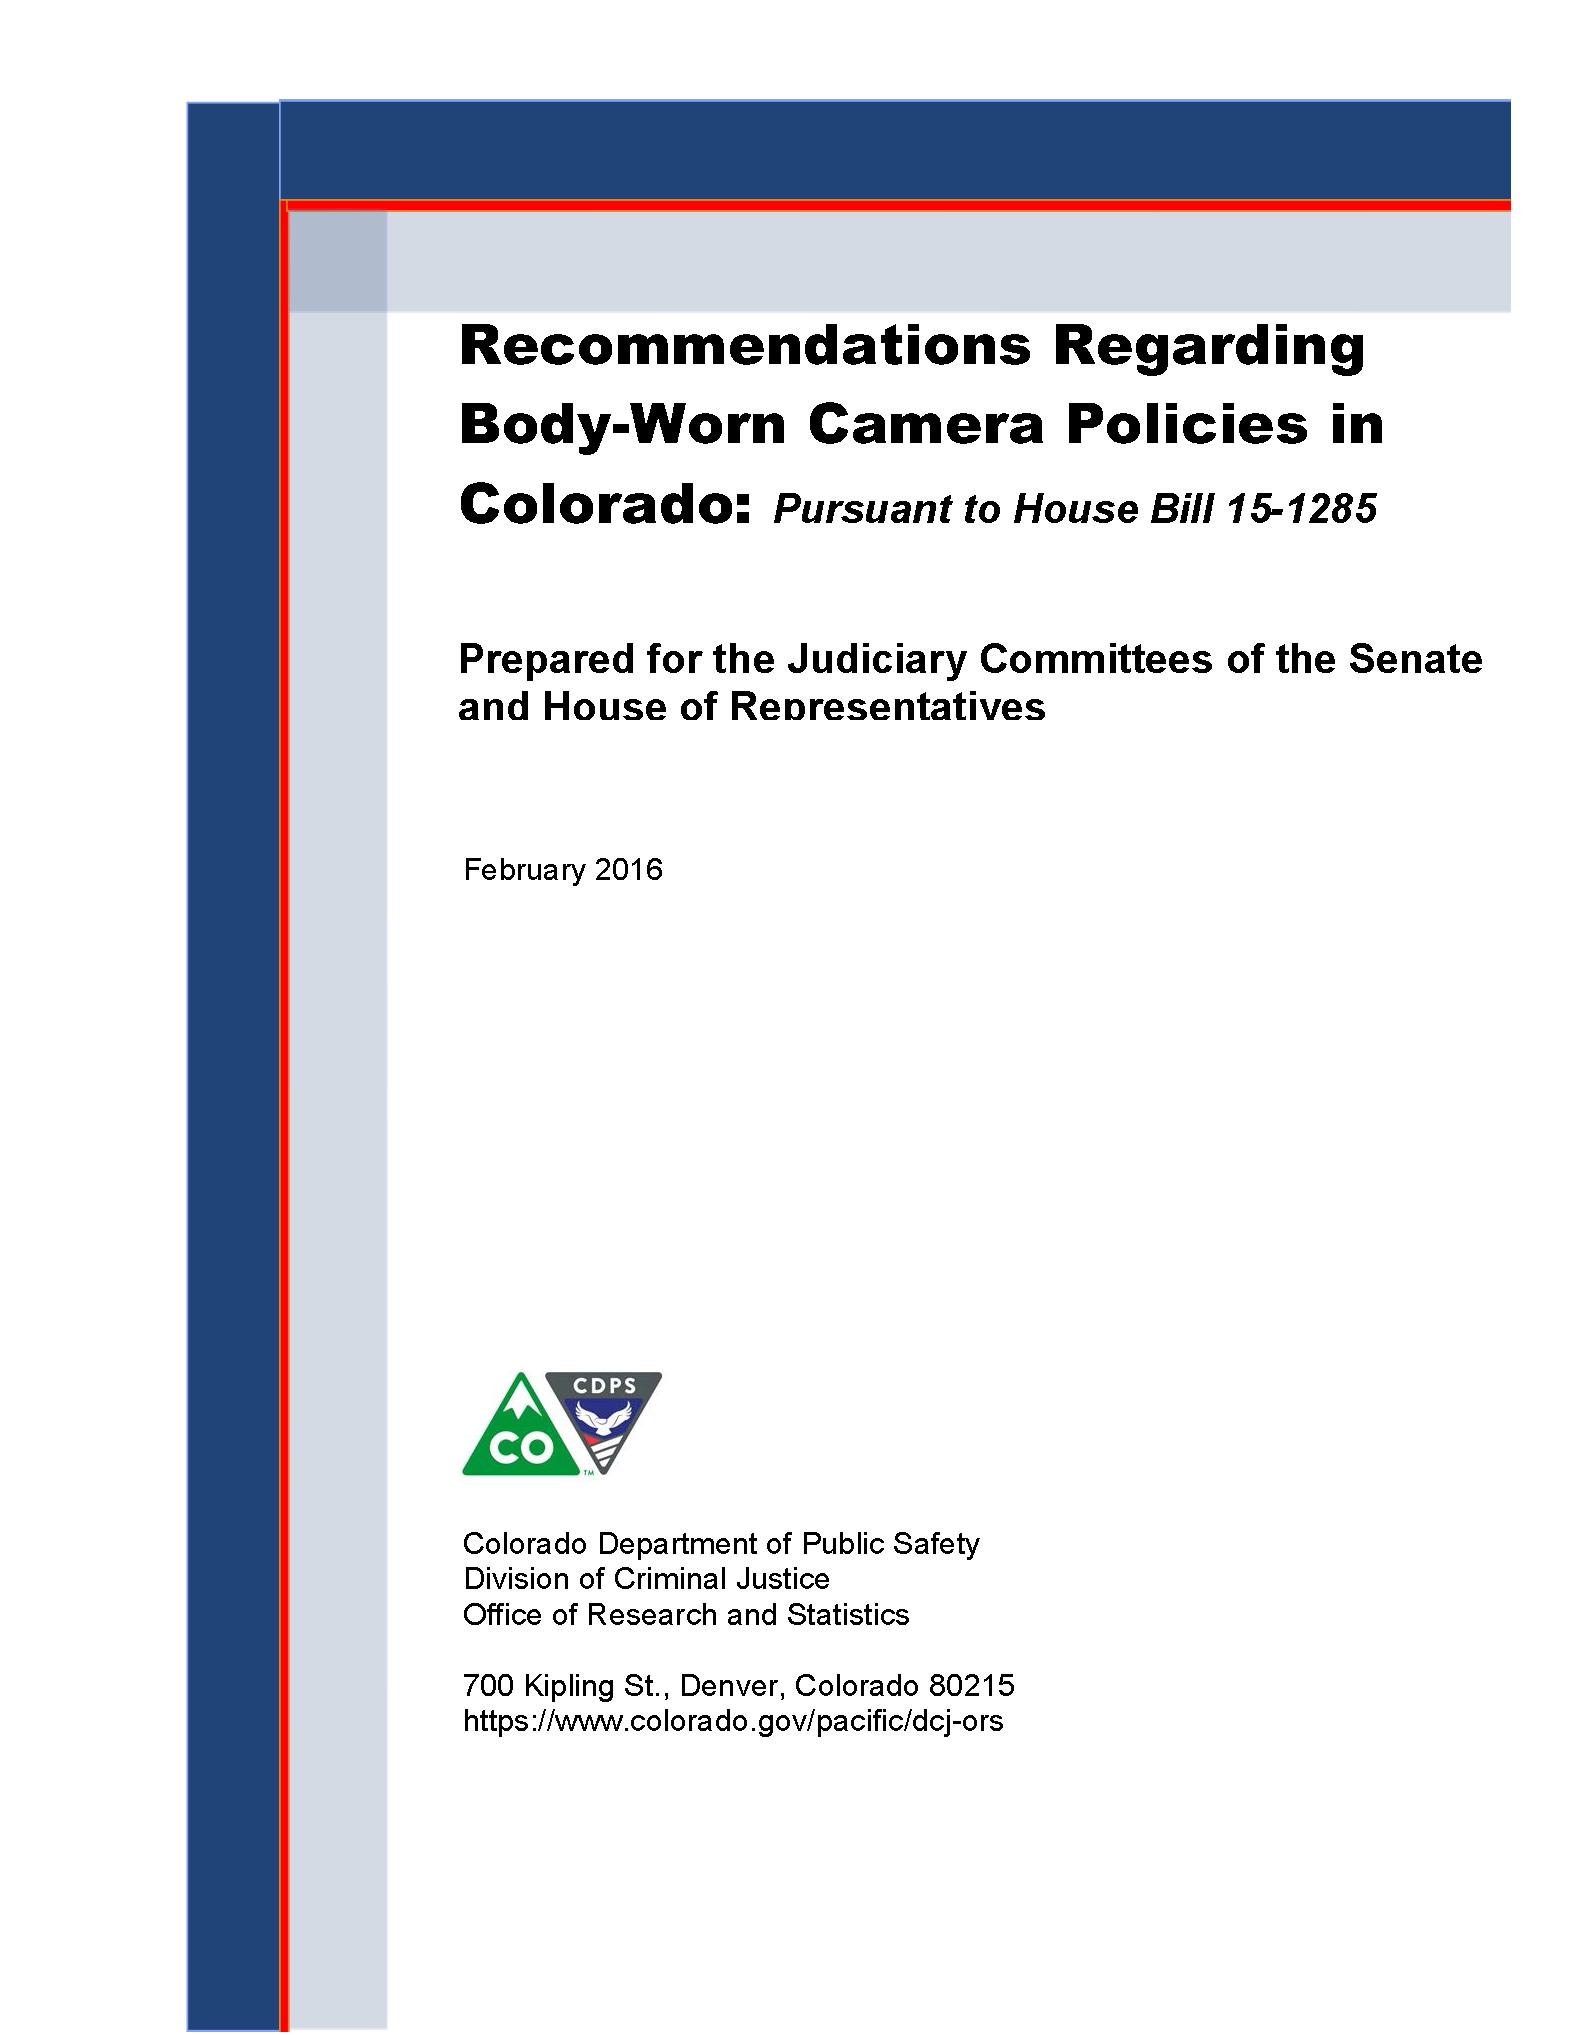 Recommendations Regarding Body-Worn Camera Policies in Colorado (February 2016)